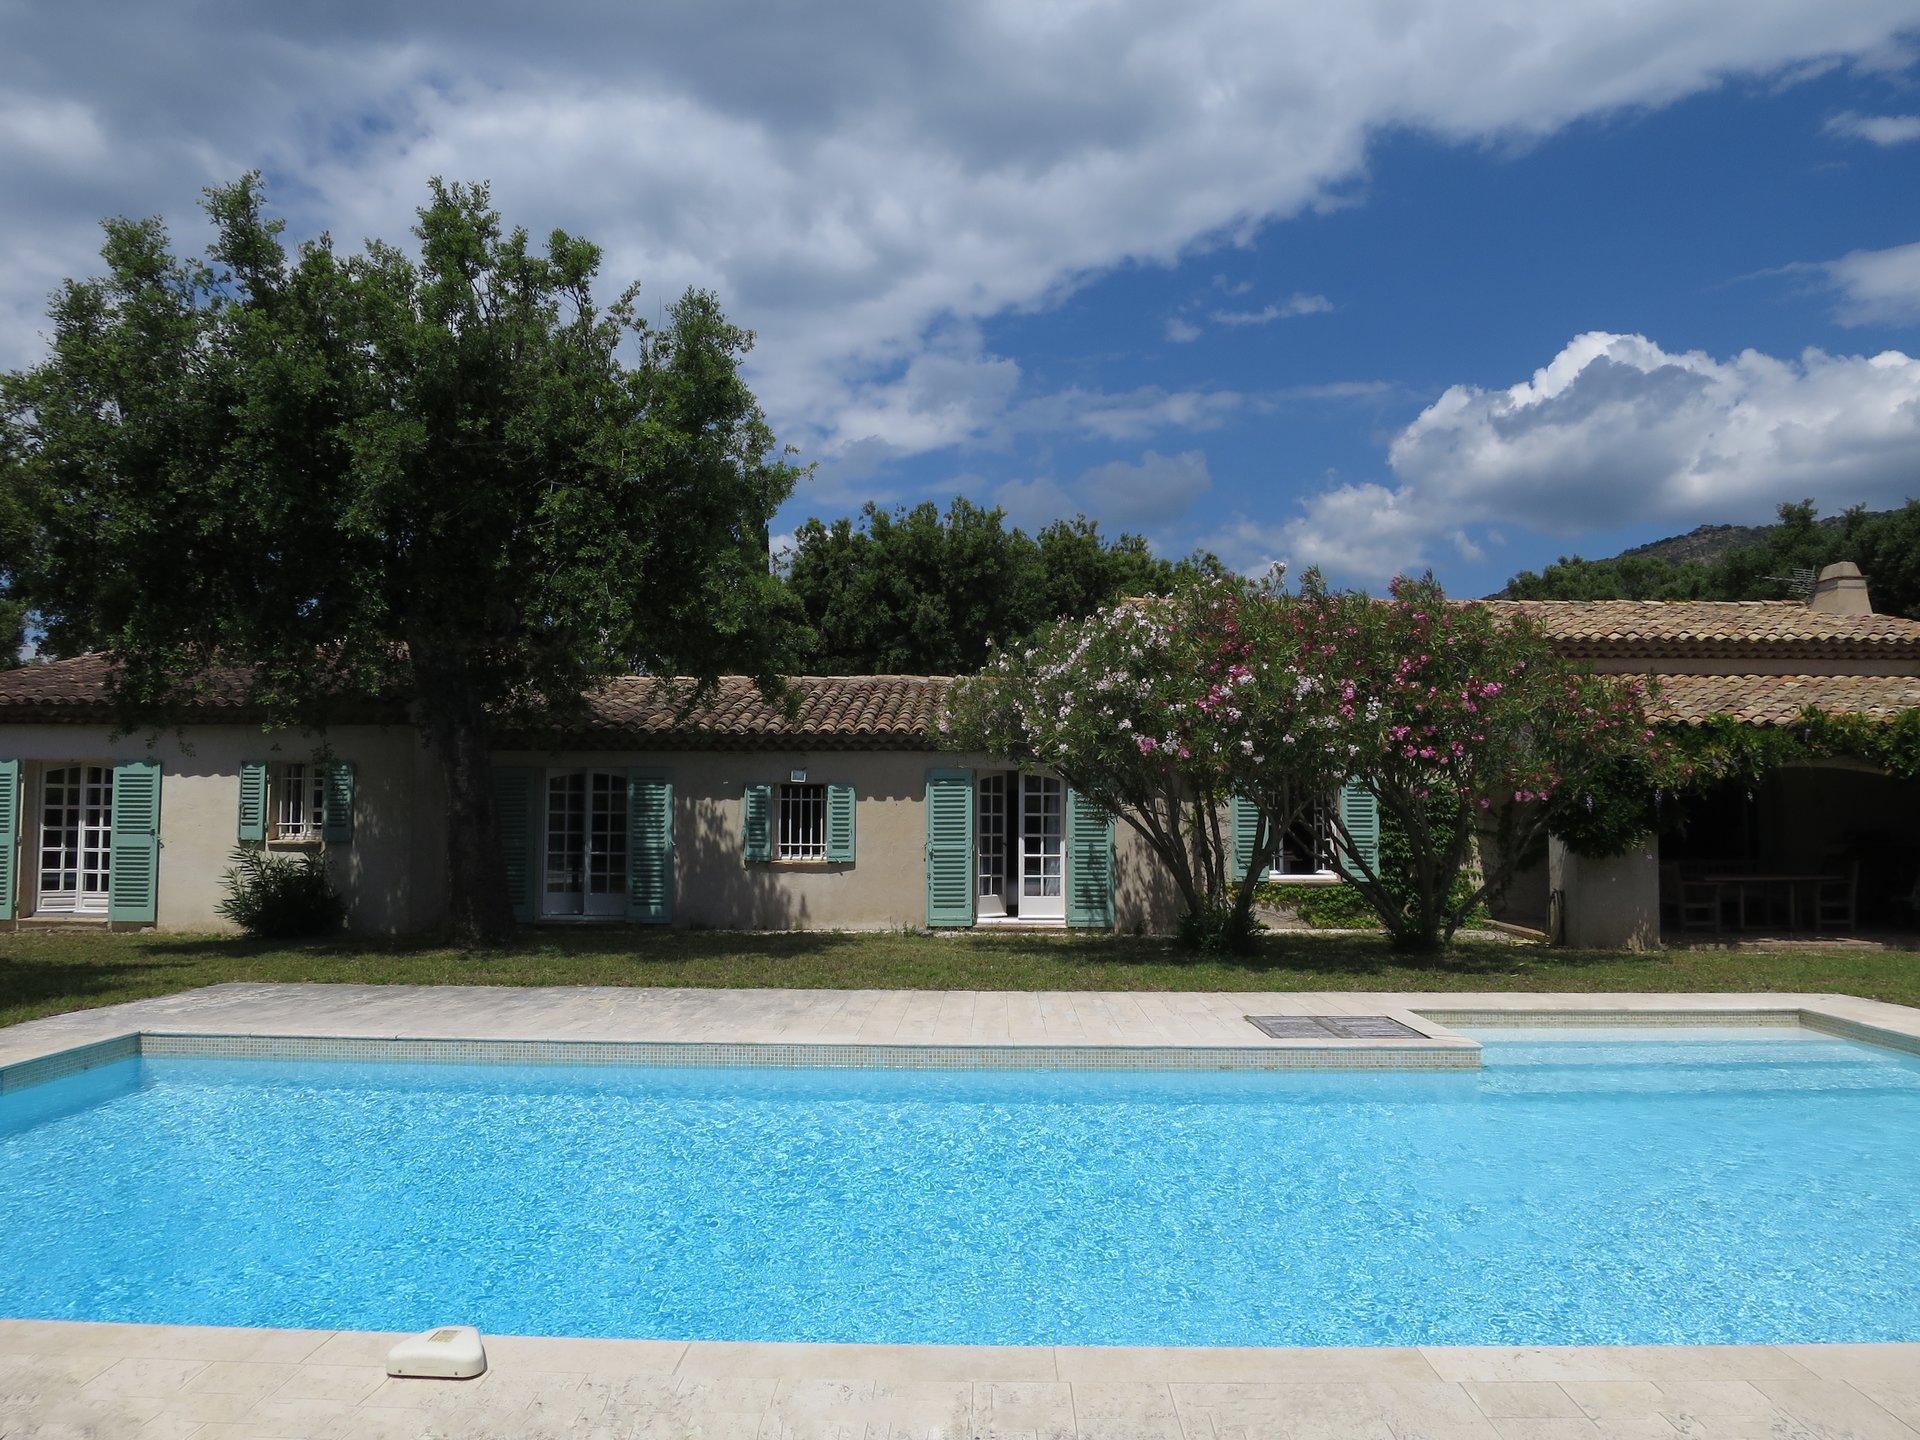 5 BEDROOM VILLA/HOUSE FOR SALE IN LE LAVANDOU